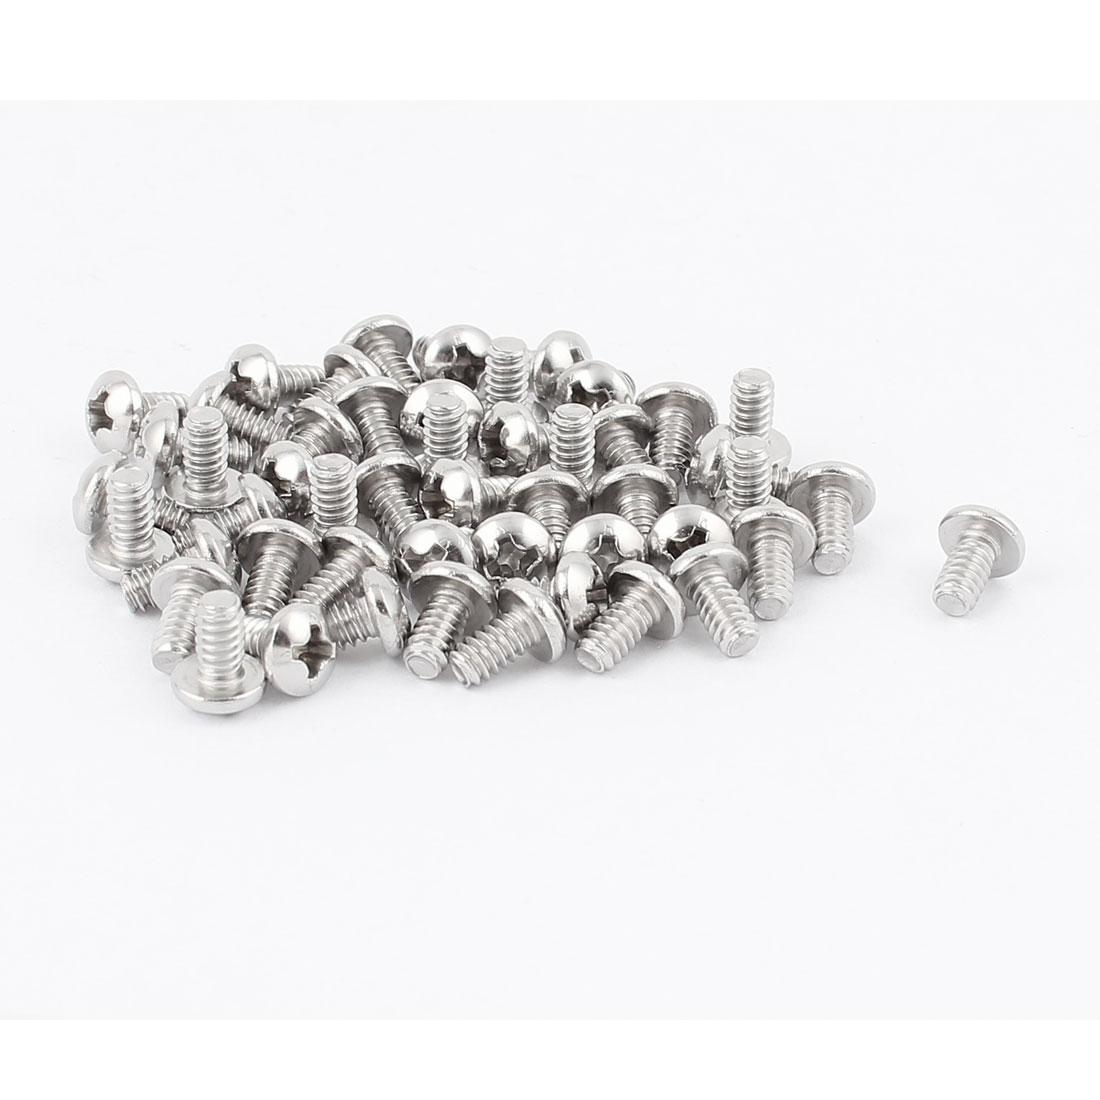 "50 Pcs #6-32 x 1/4"" Stainless Steel Phillips Truss Head Machine Screws Fasteners"